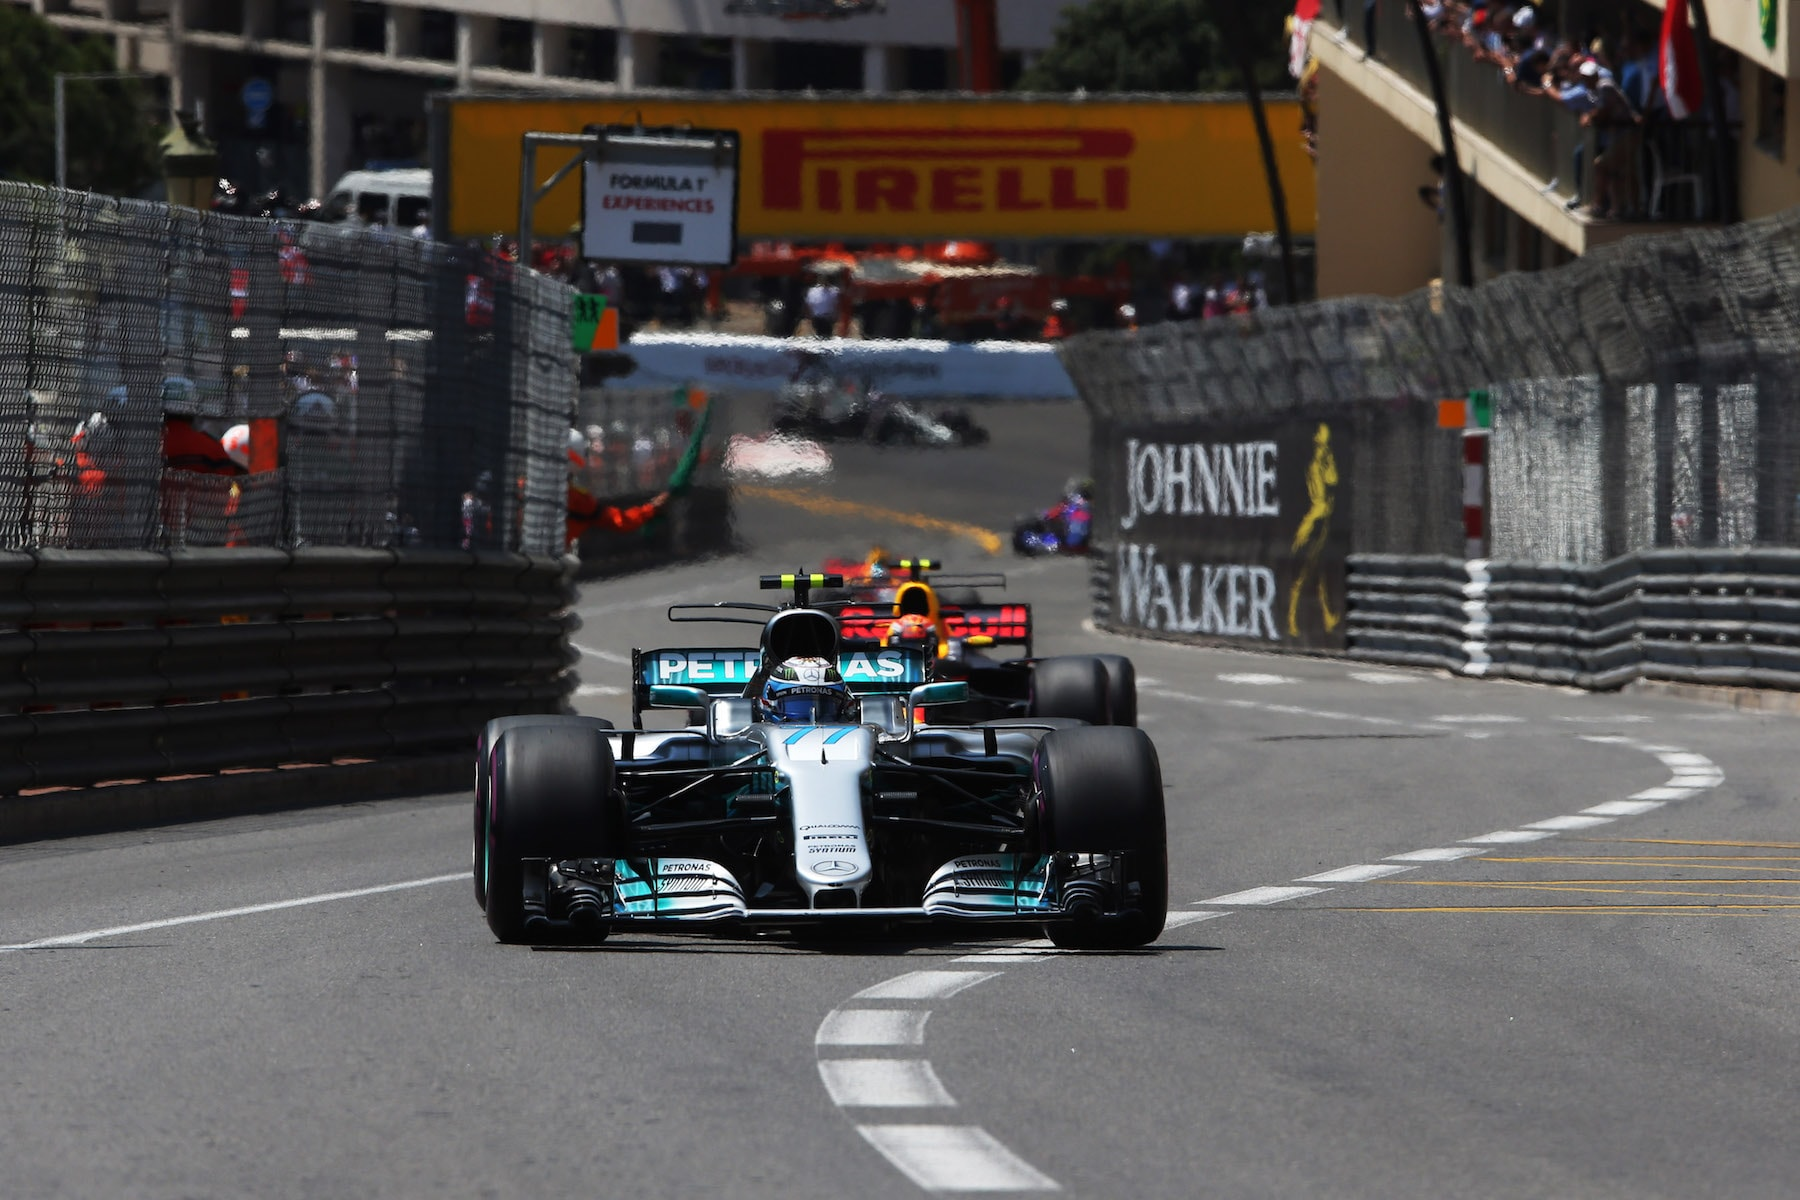 D 2017 Valtteri Bottas | Mercedes W08 | 2017 Monaco GP P4 2 copy.jpg